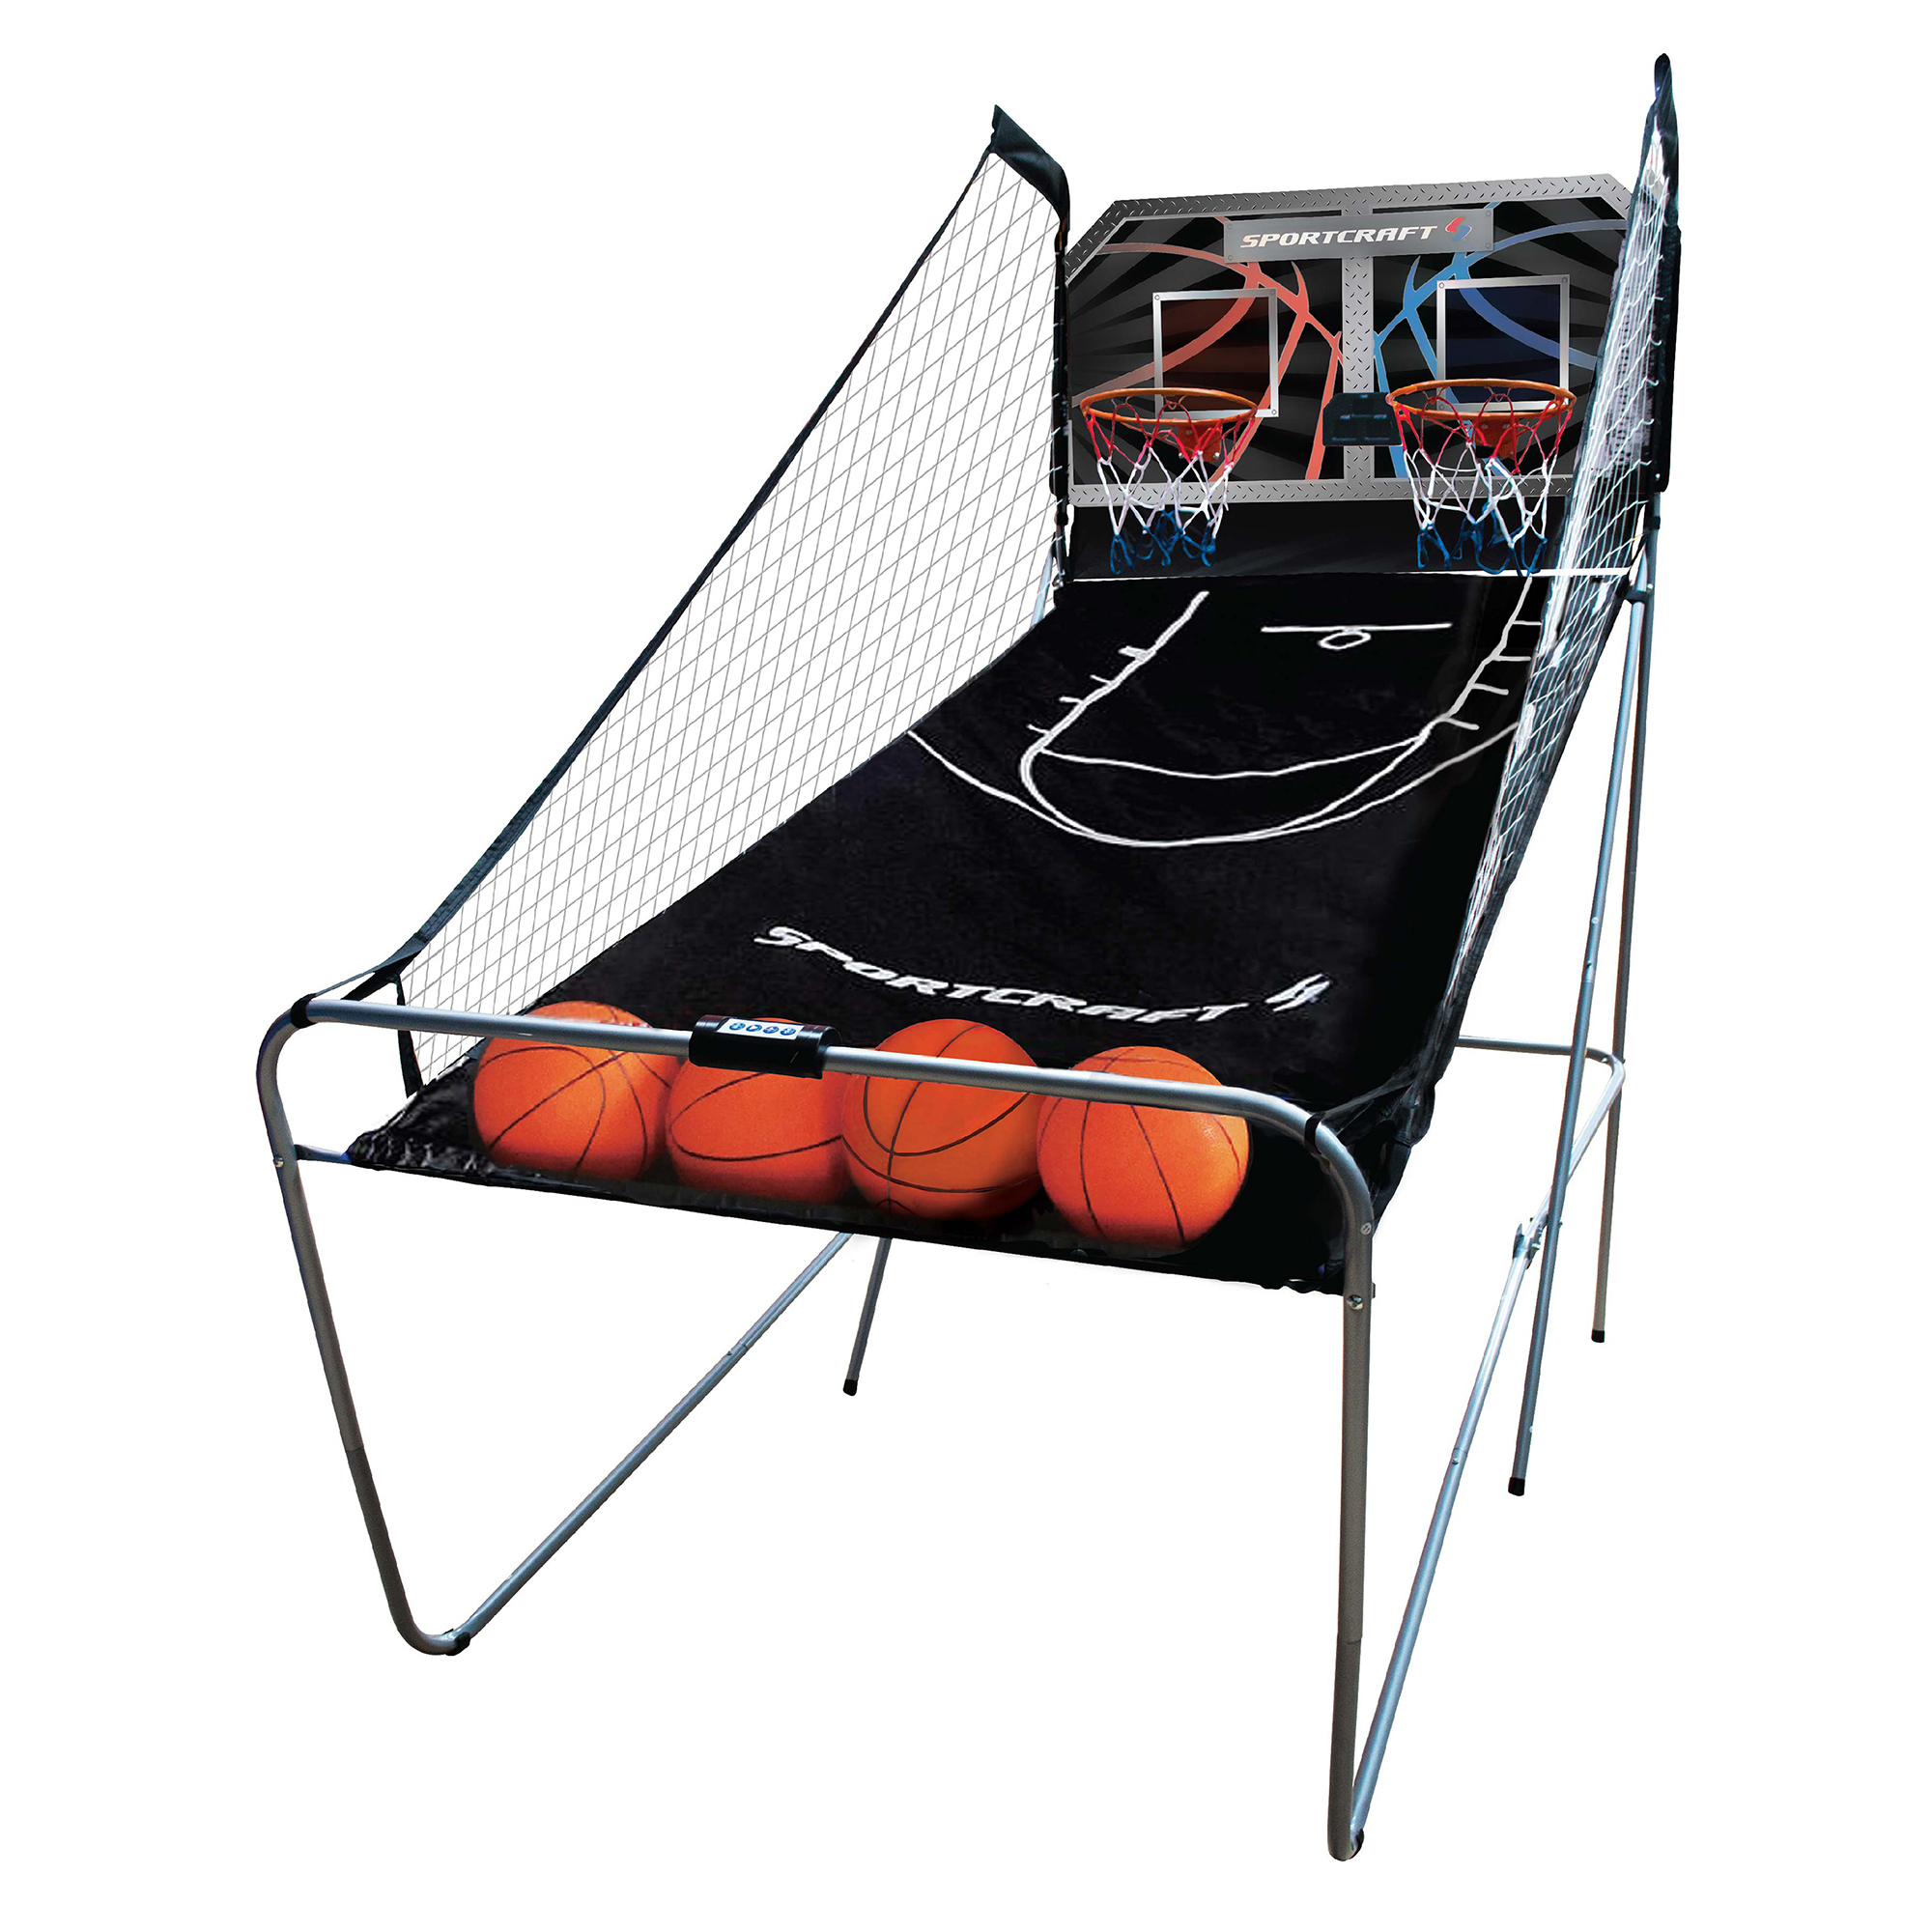 Sportcraft Double Hoop Basketball Game